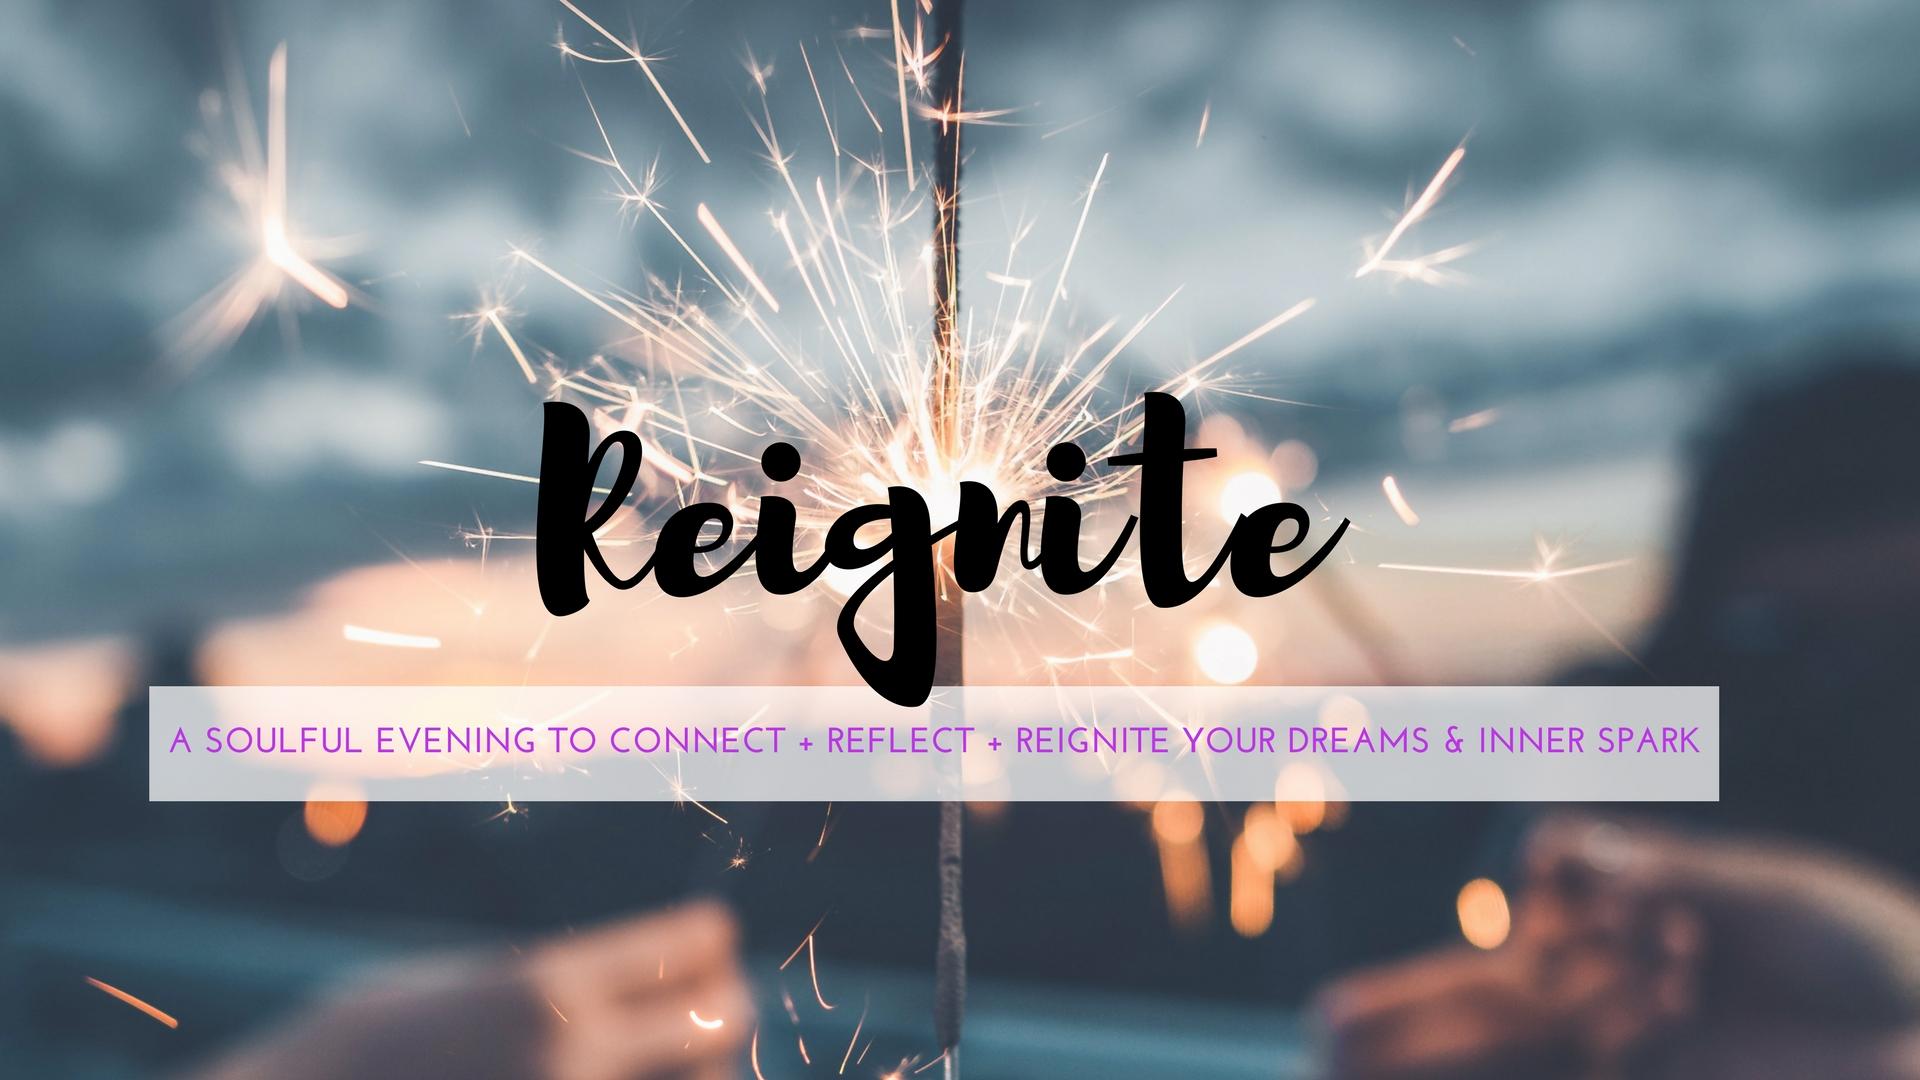 Re-ignite.jpg